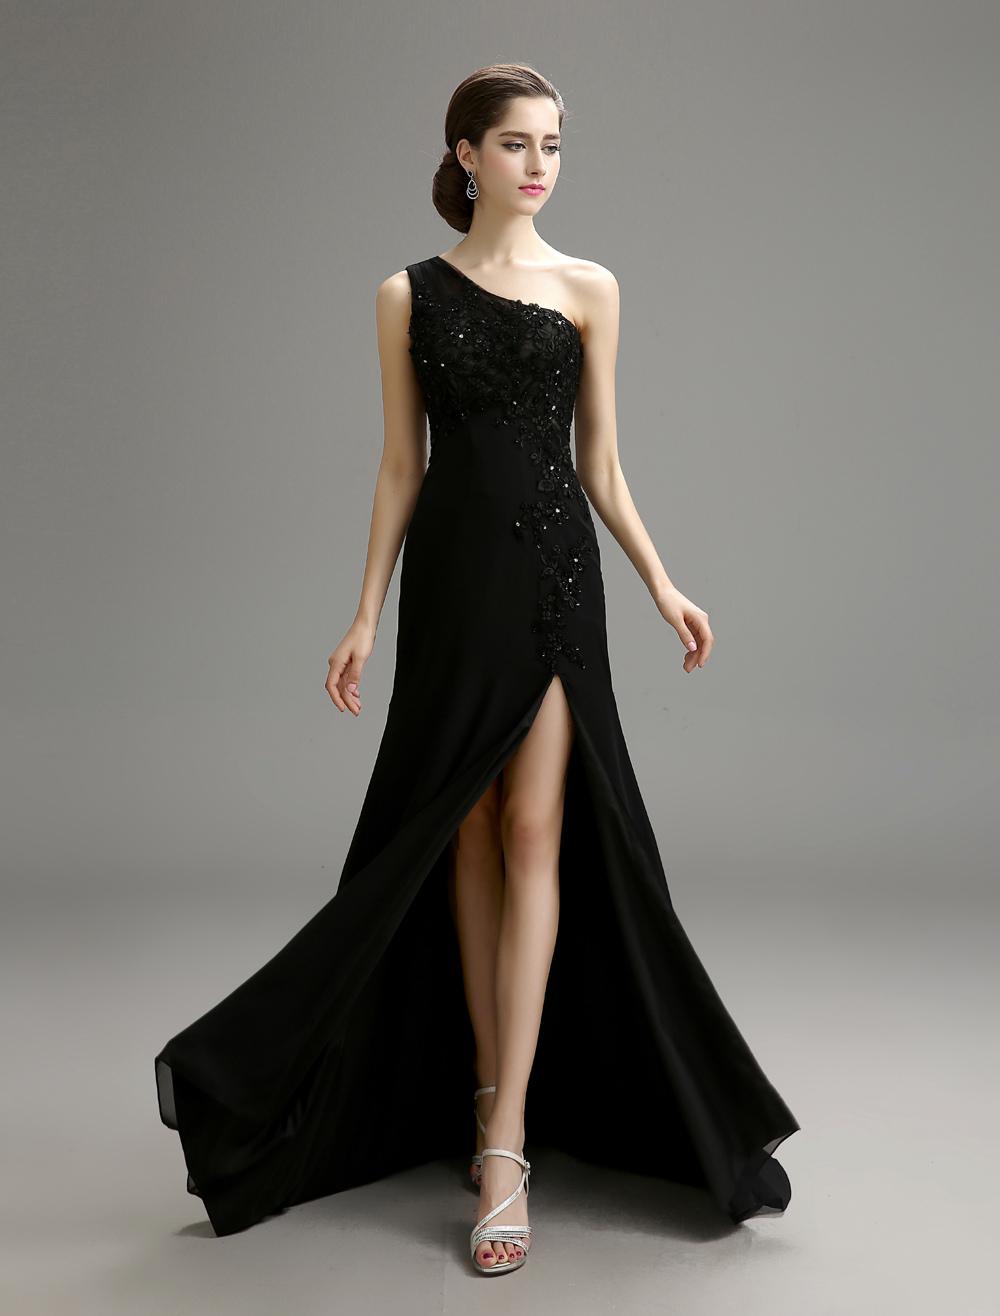 Black Wedding Dress One-Shoulder Chiffon Dress with High Slit Detail photo